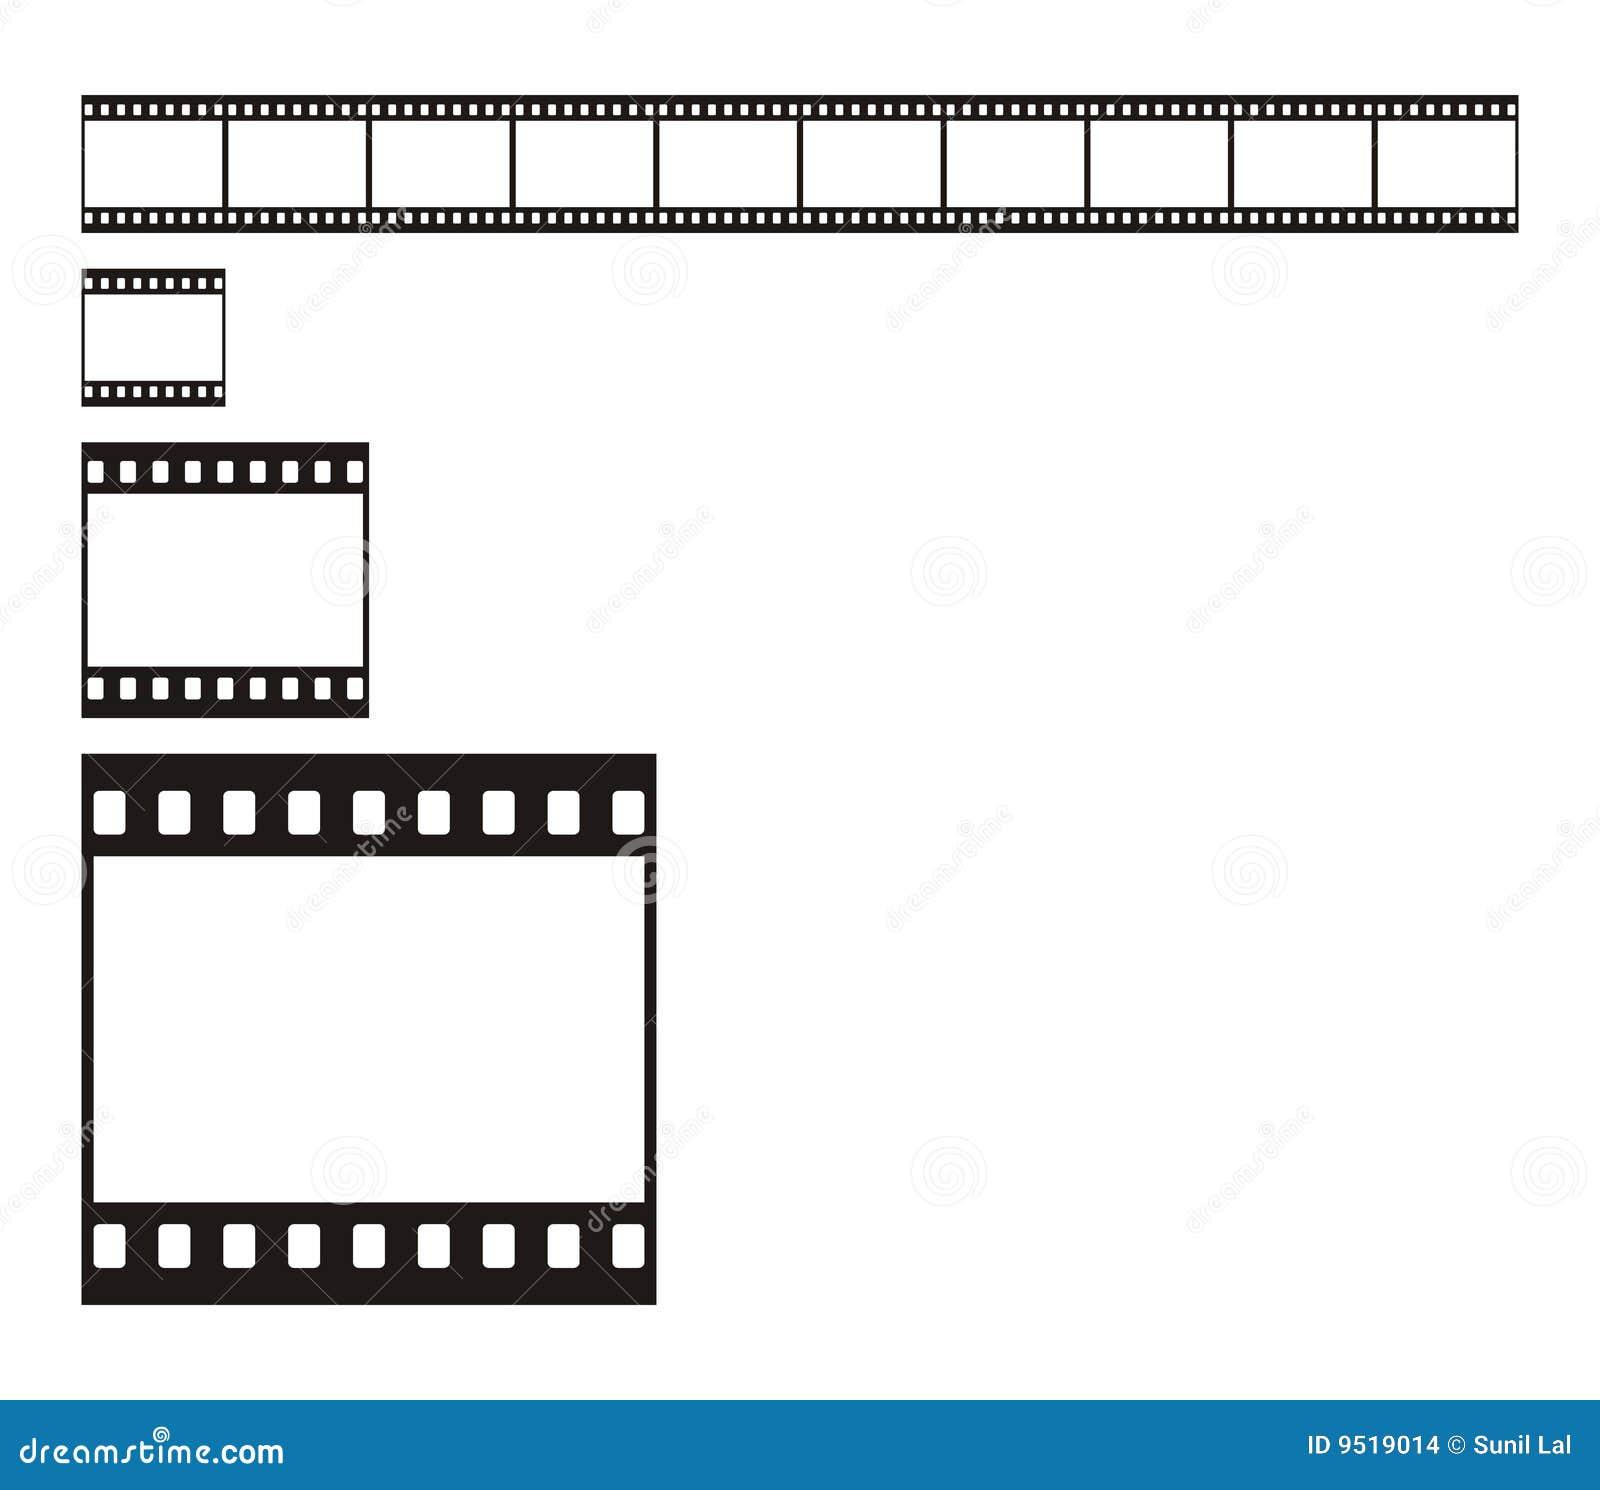 35 filmmillimetrar band